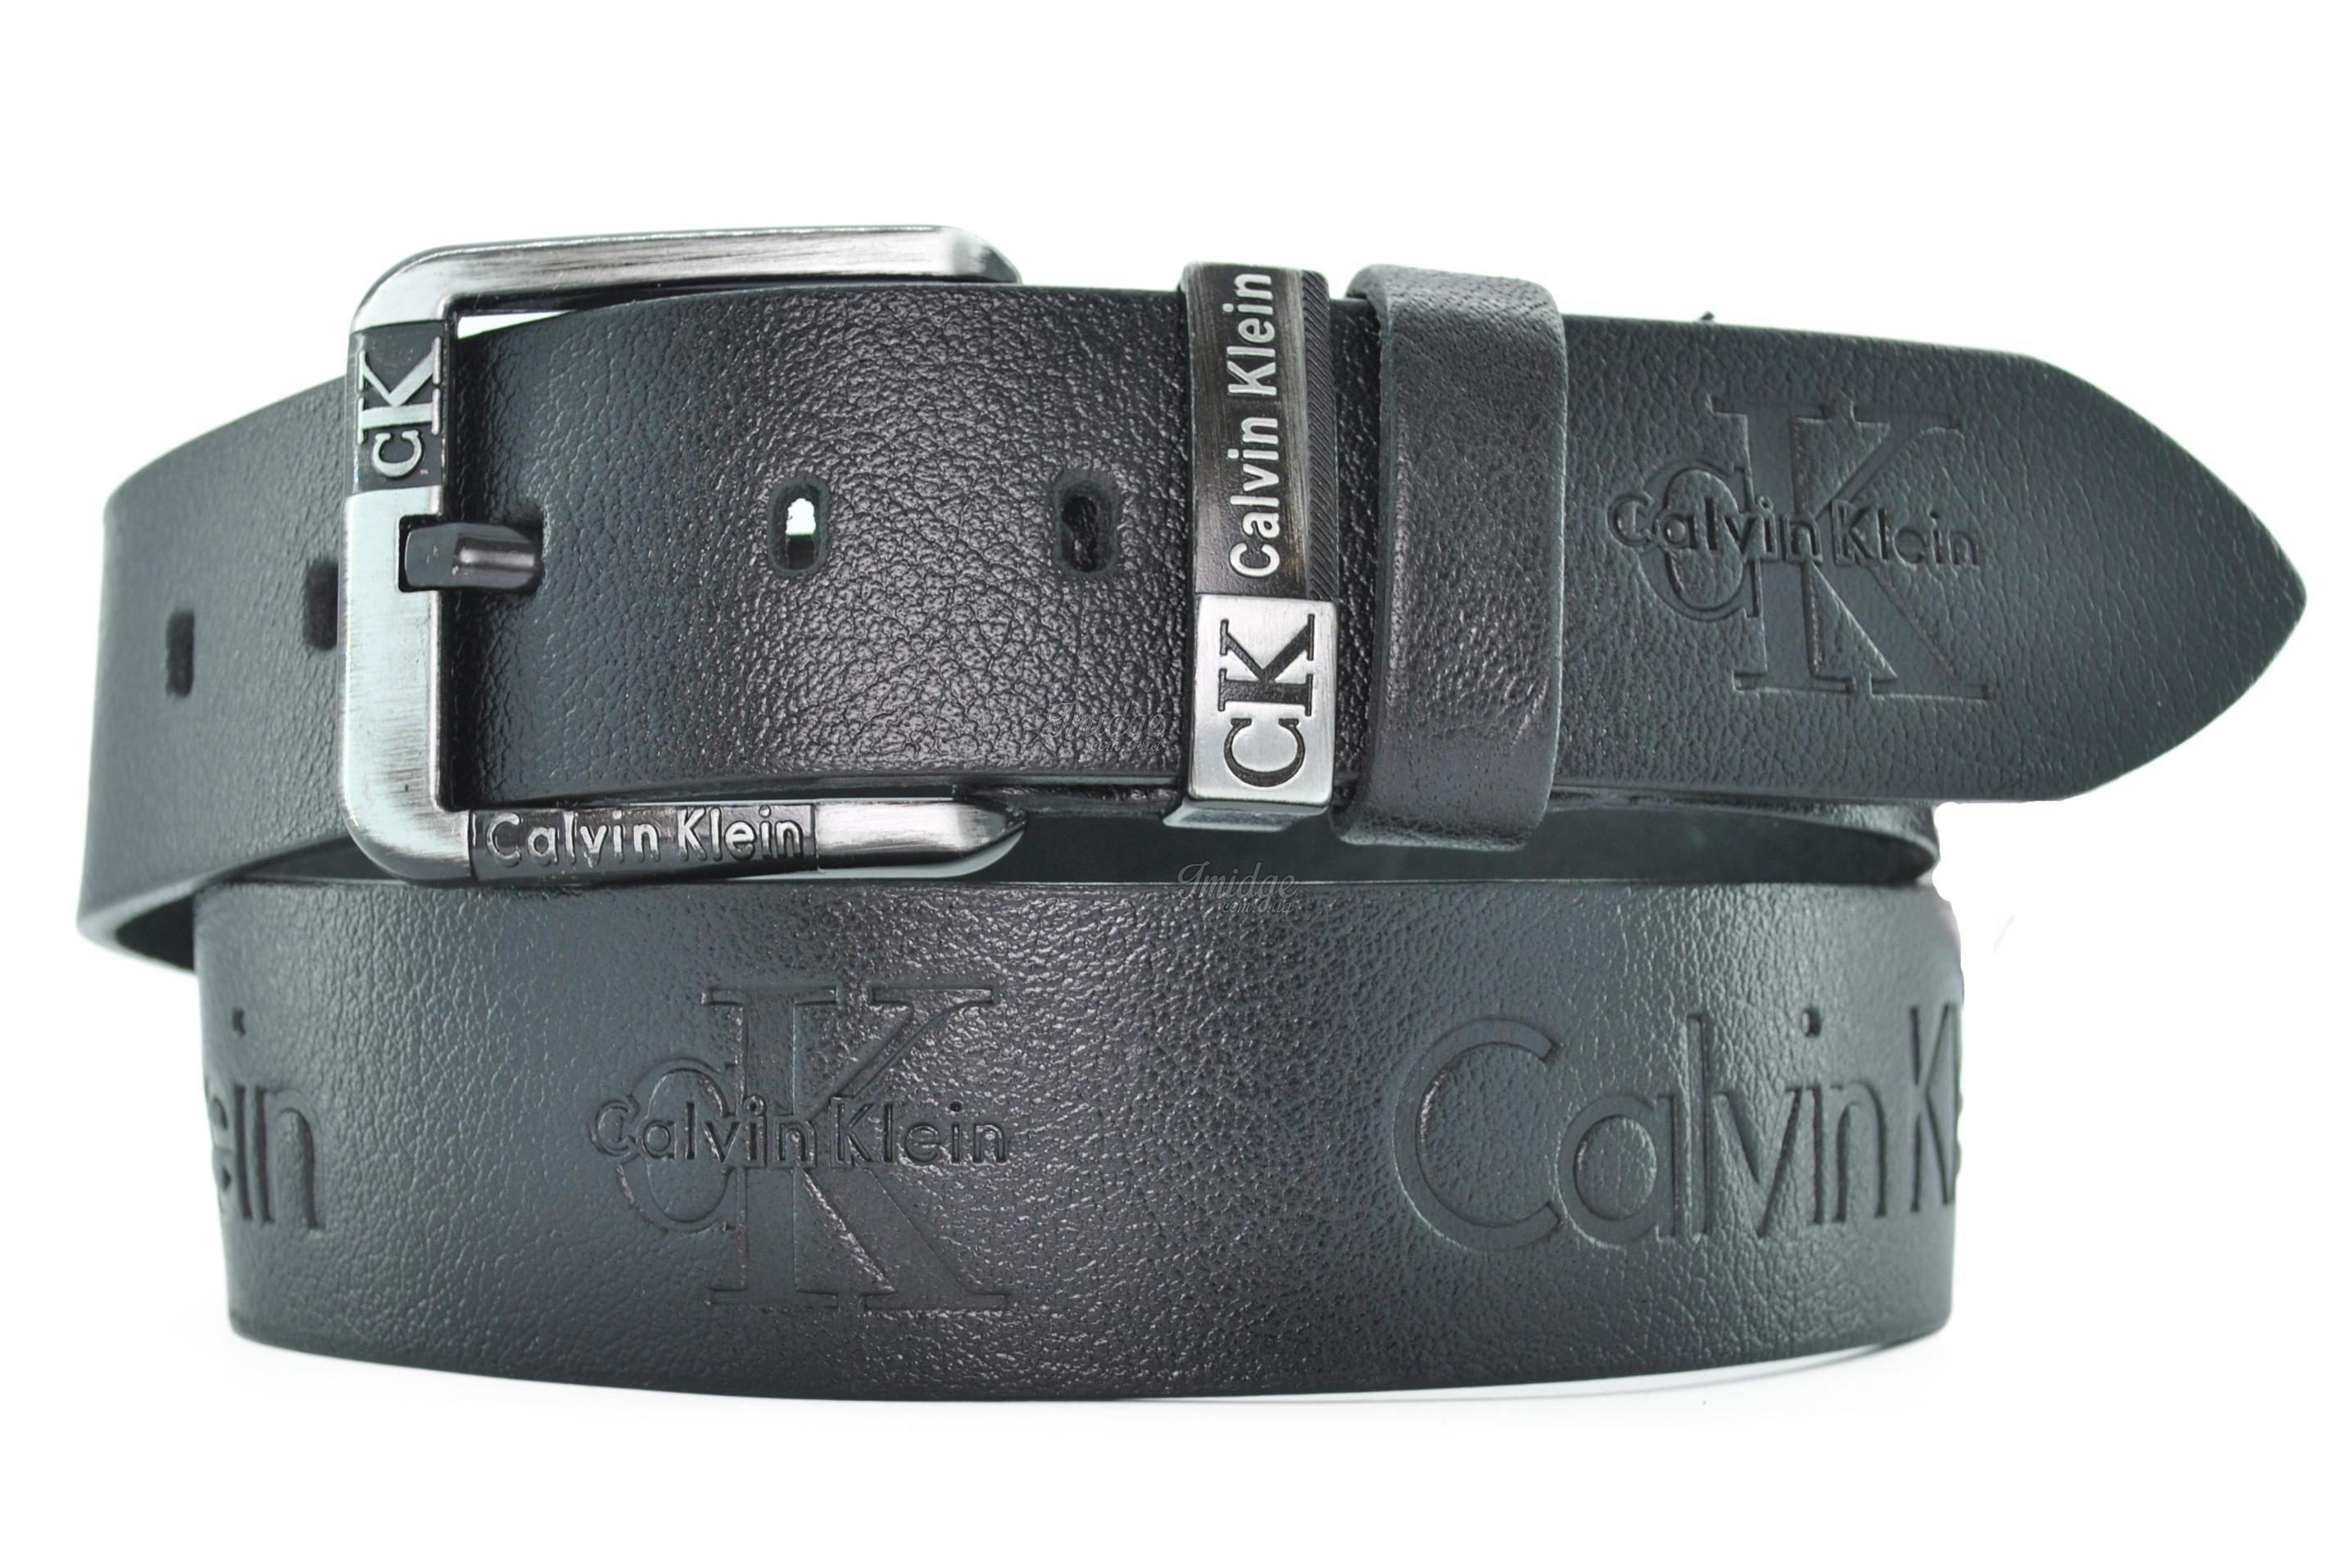 Ремень Calvin Klein №B0848